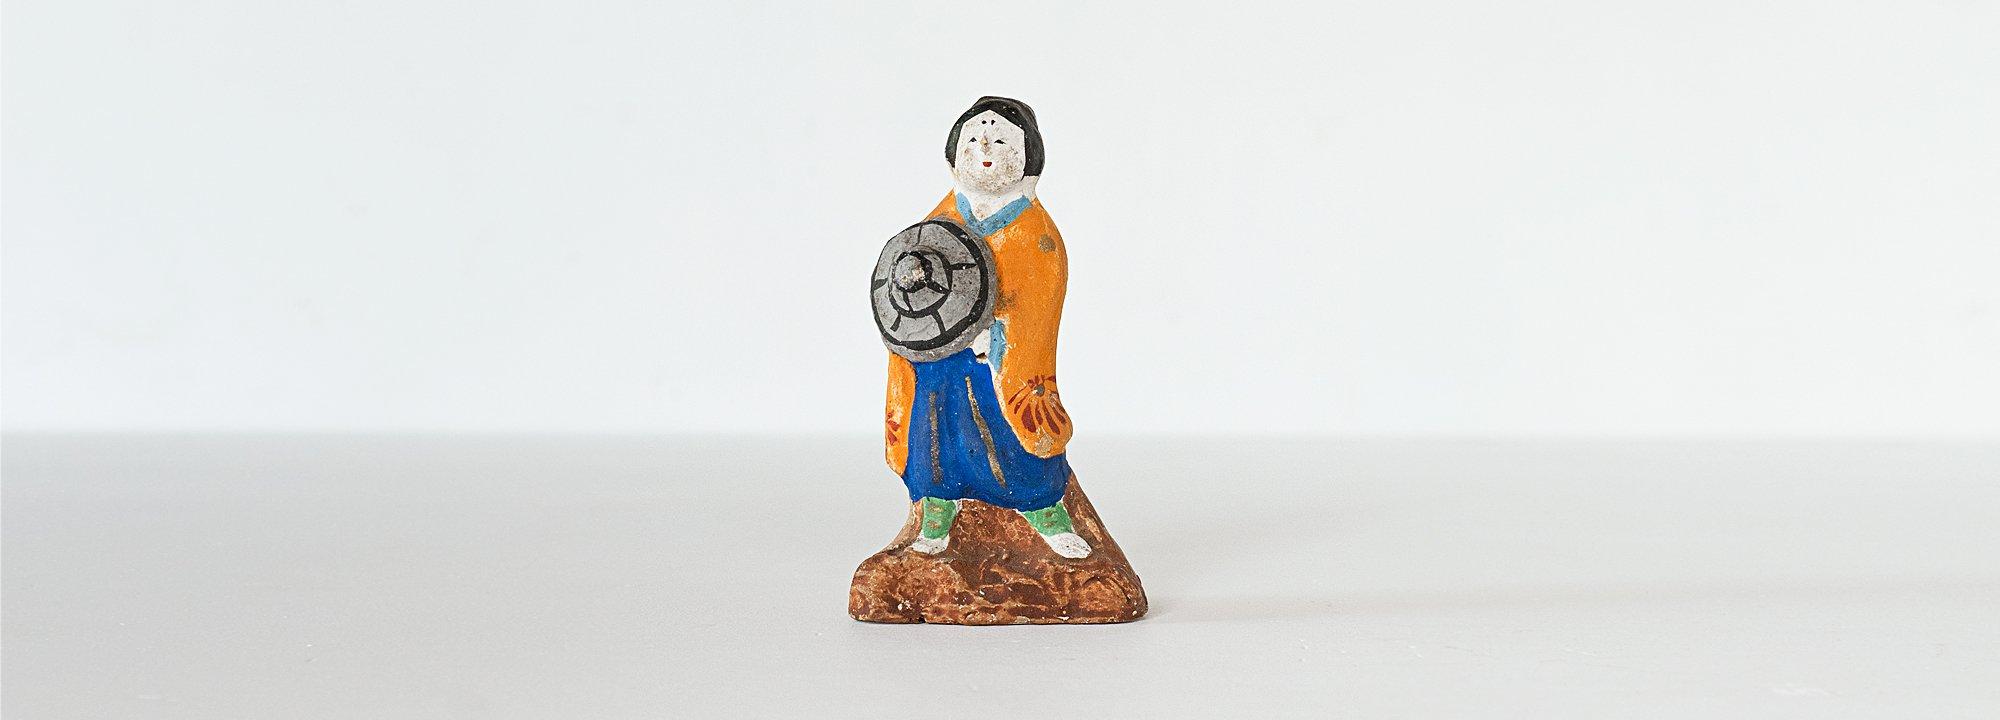 Vintage Object : Japanese Tsuchi Ningyo - Woman